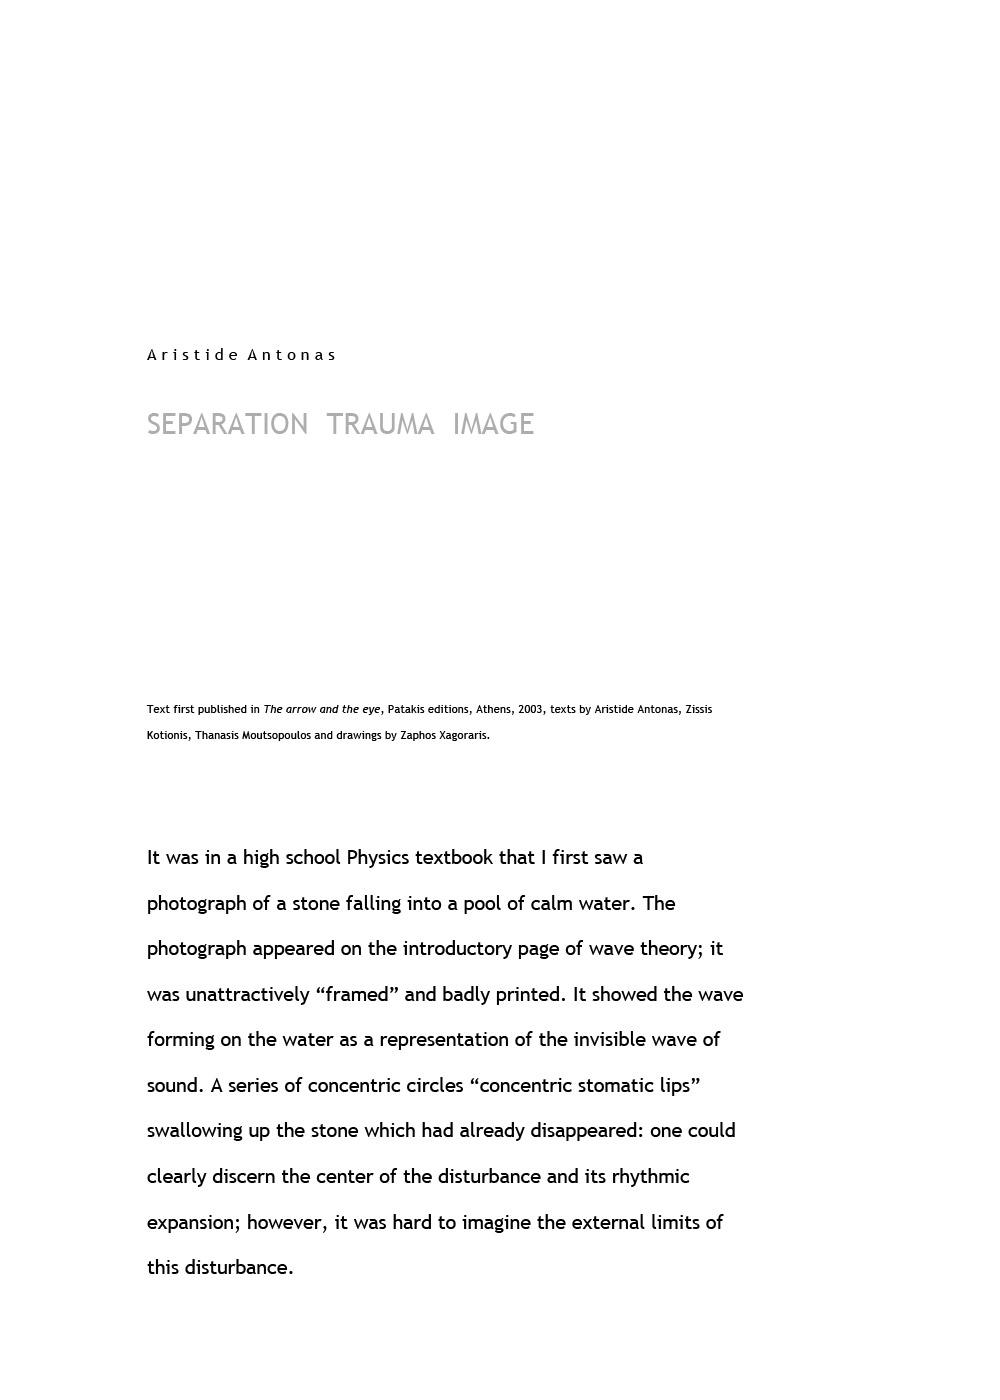 Separation Trauma Image